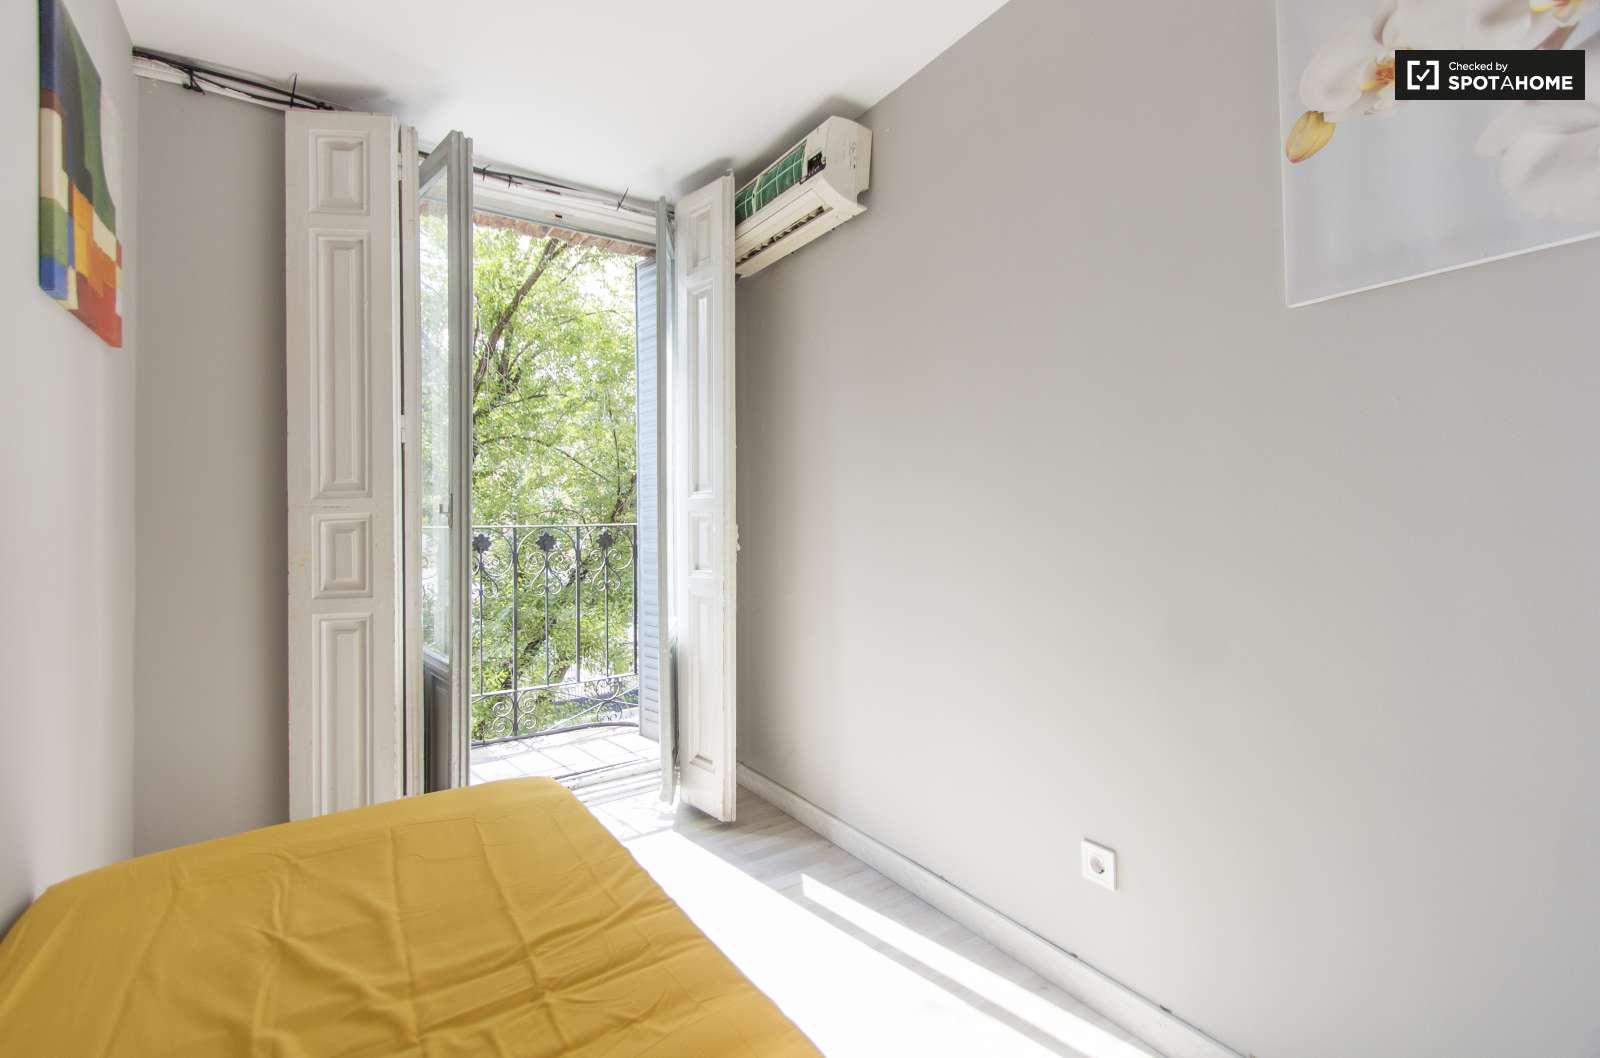 Cozy room in 5-bedroom apartment in Rios Rosas, Madrid (ref: 232551 ...